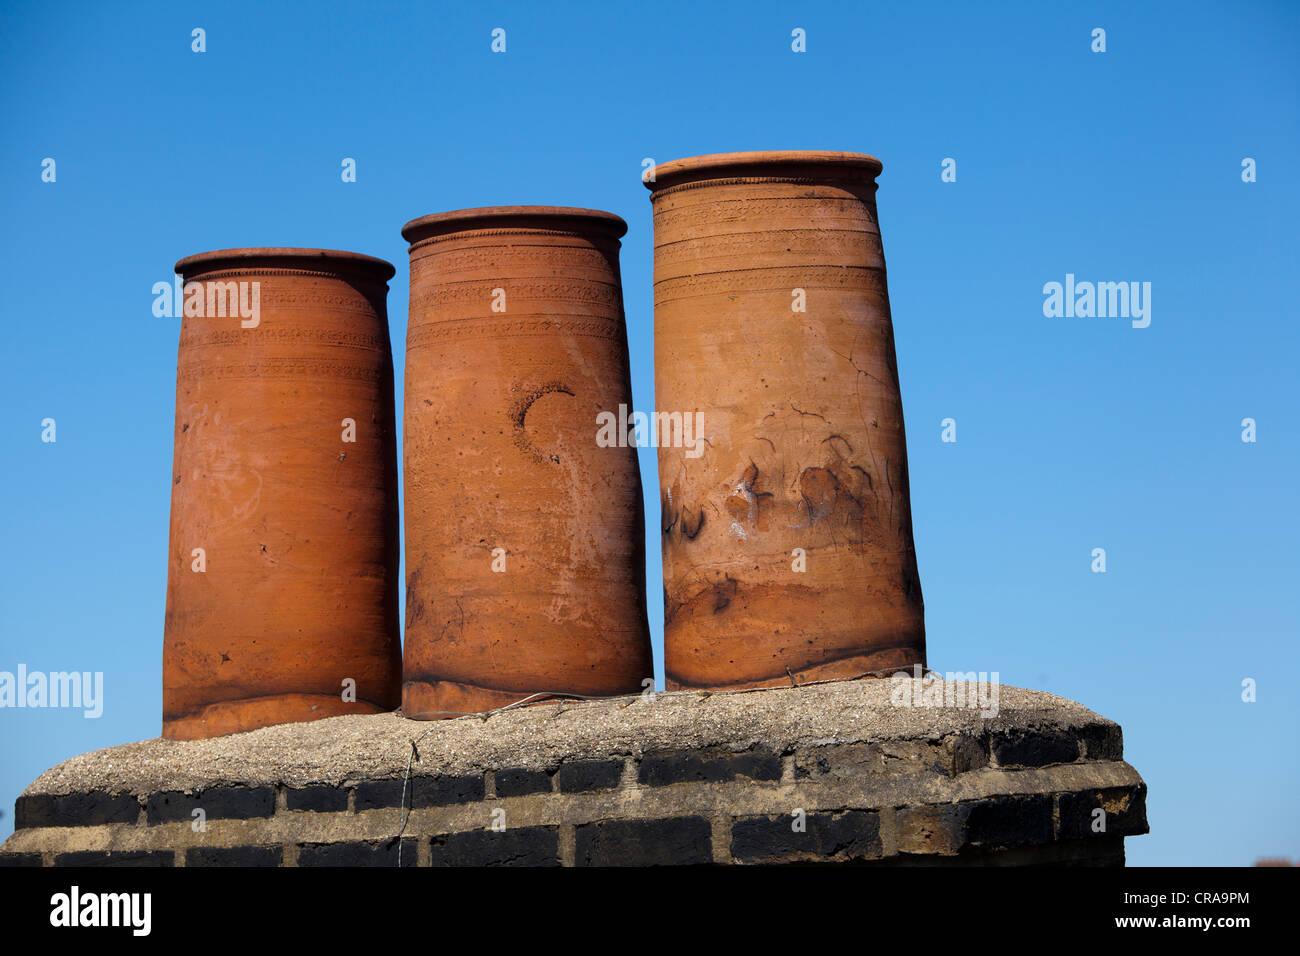 chimney pots of London - Stock Image